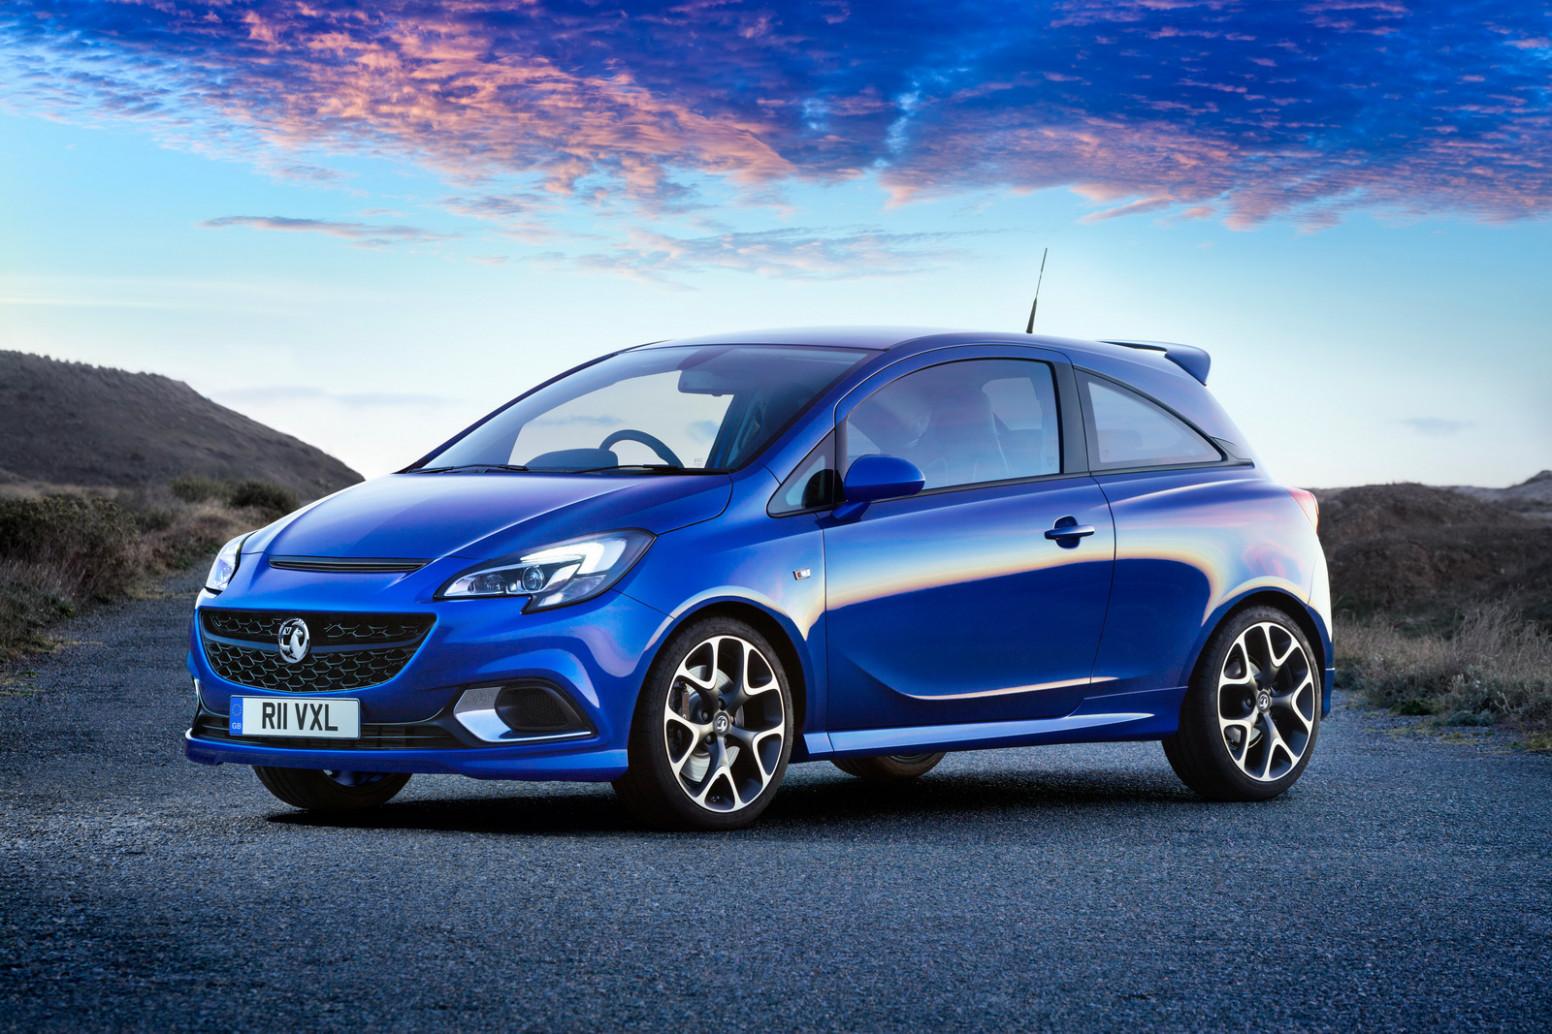 Pricing 2022 Vauxhall Corsa VXR